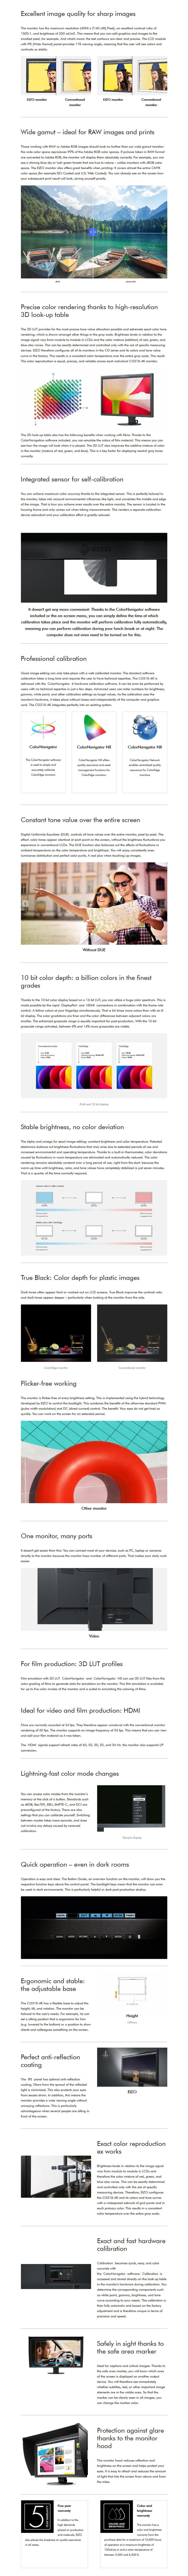 "Eizo ColorEdge CG248 23.8"" 4K UHD Professional Colour-Calibrating IPS Monitor - Desktop Overview 2"